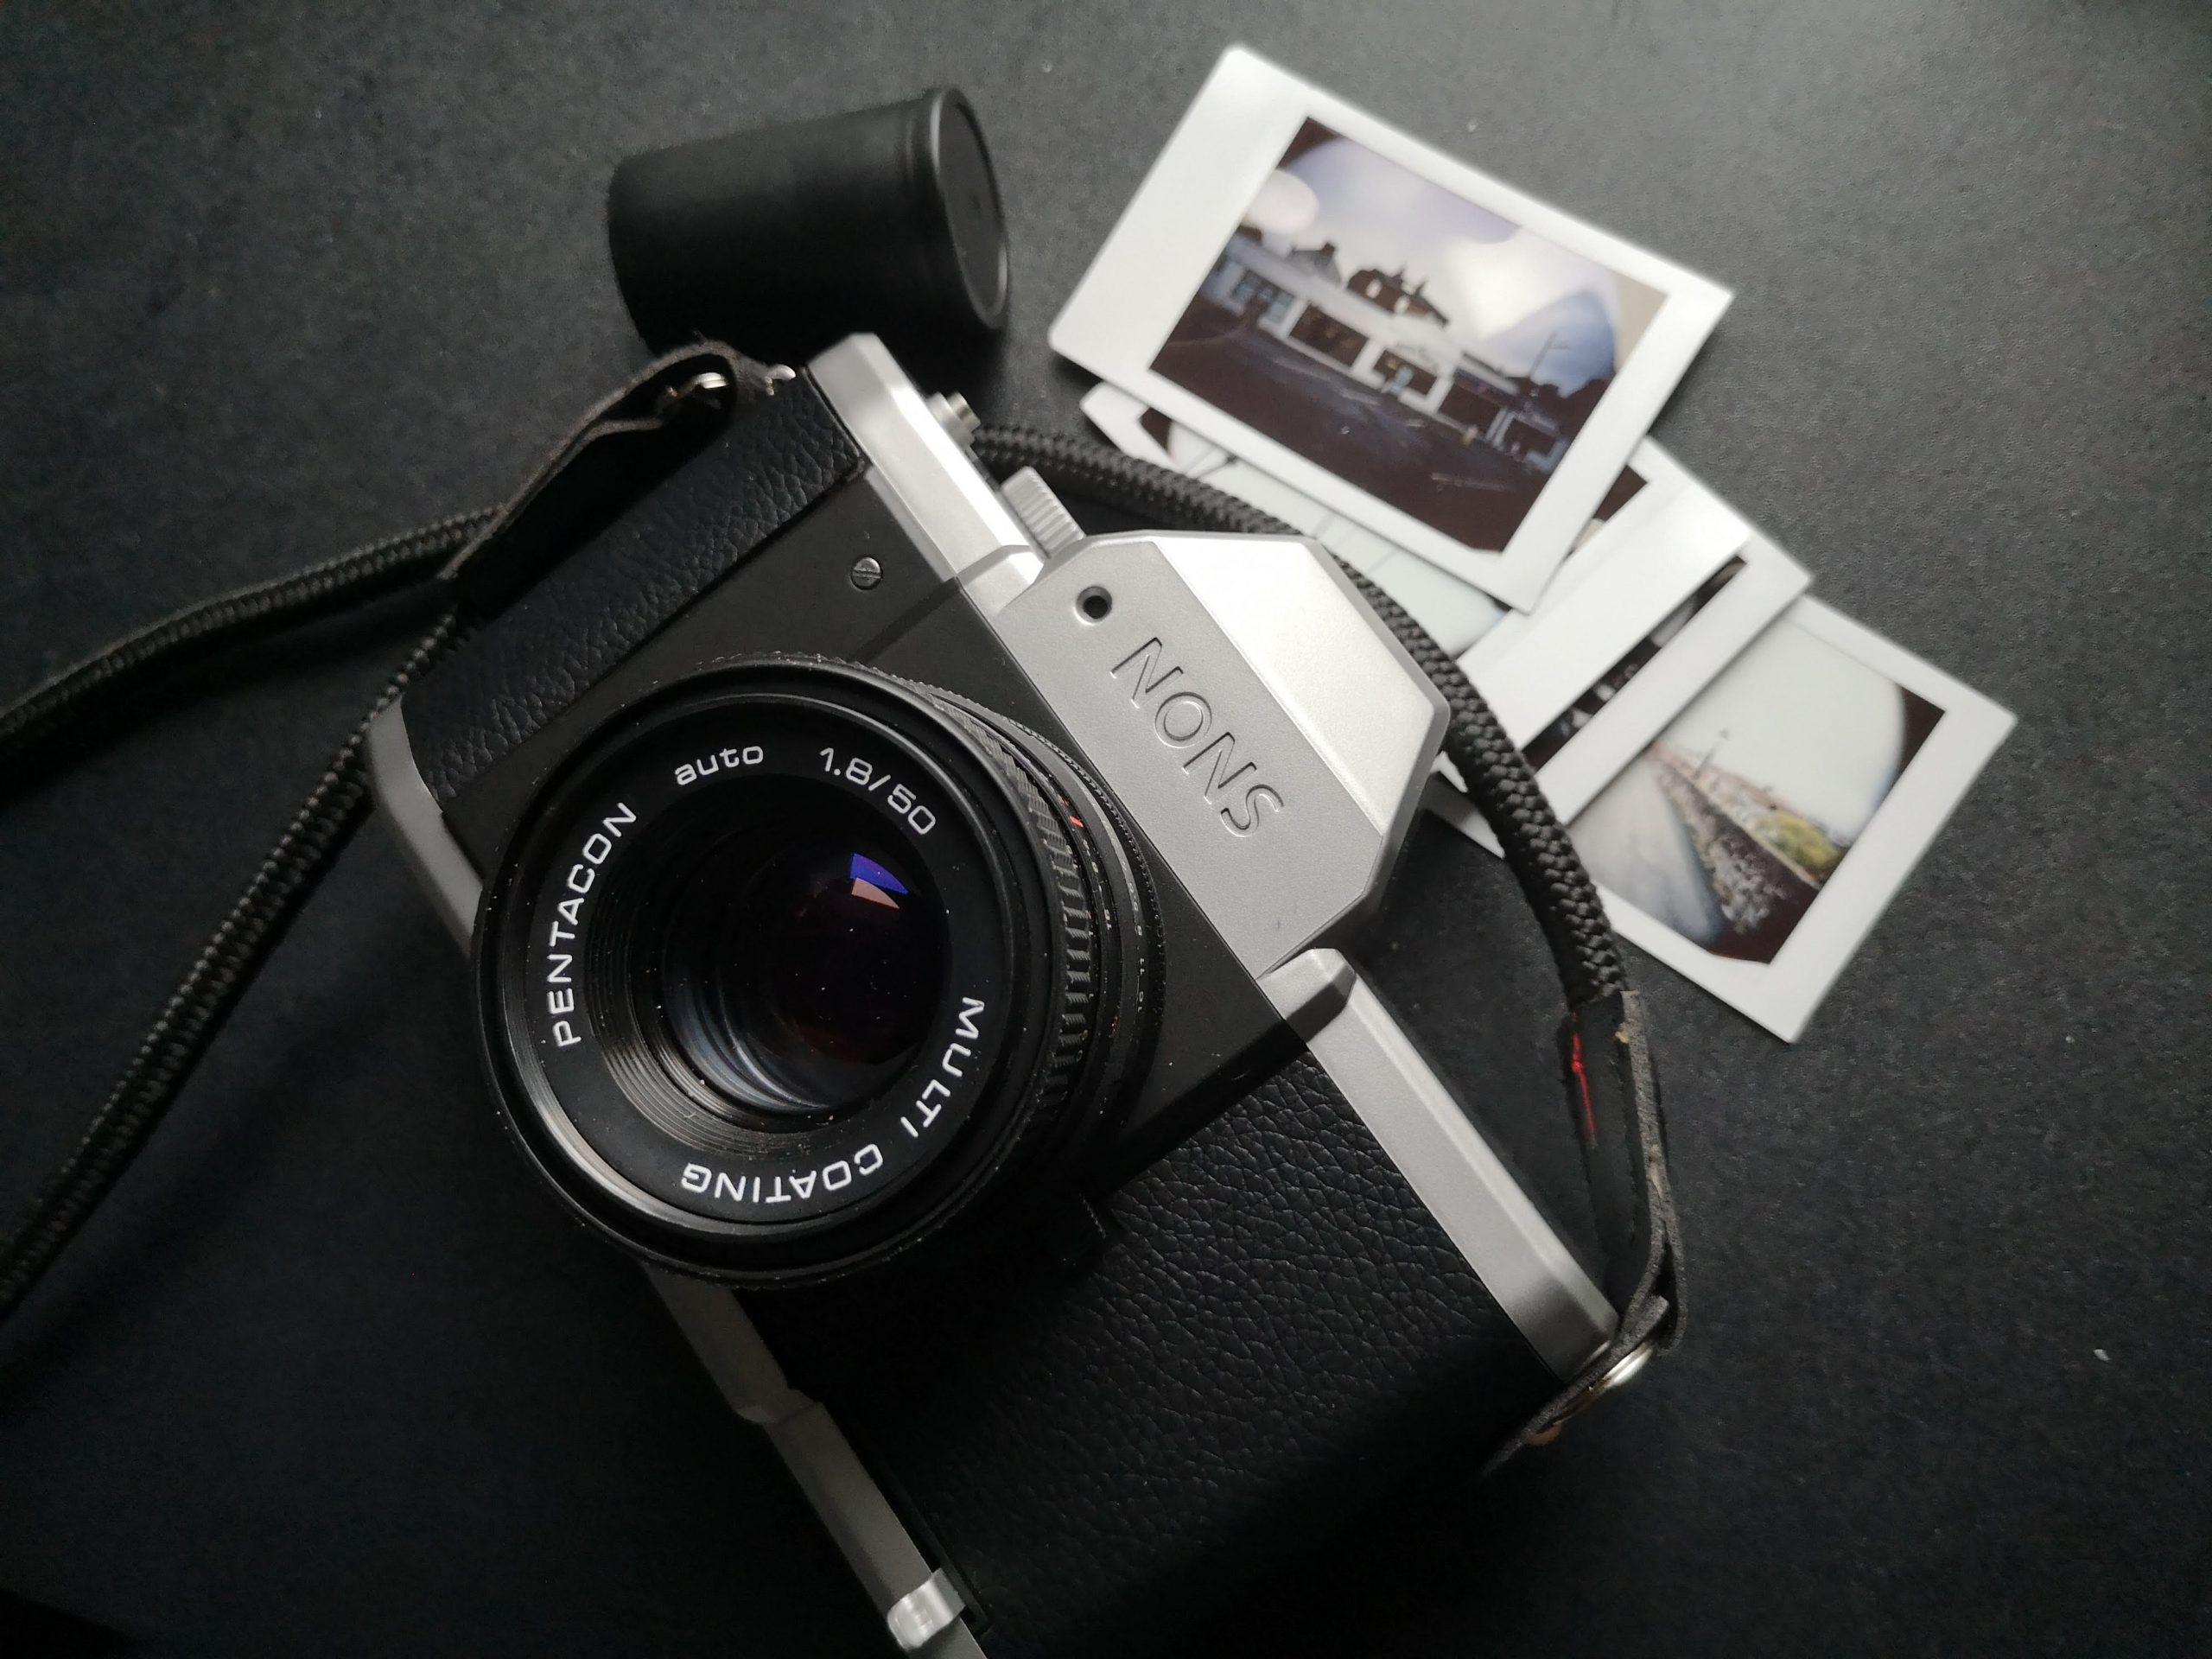 Nons SL42 with Pentacon Lens